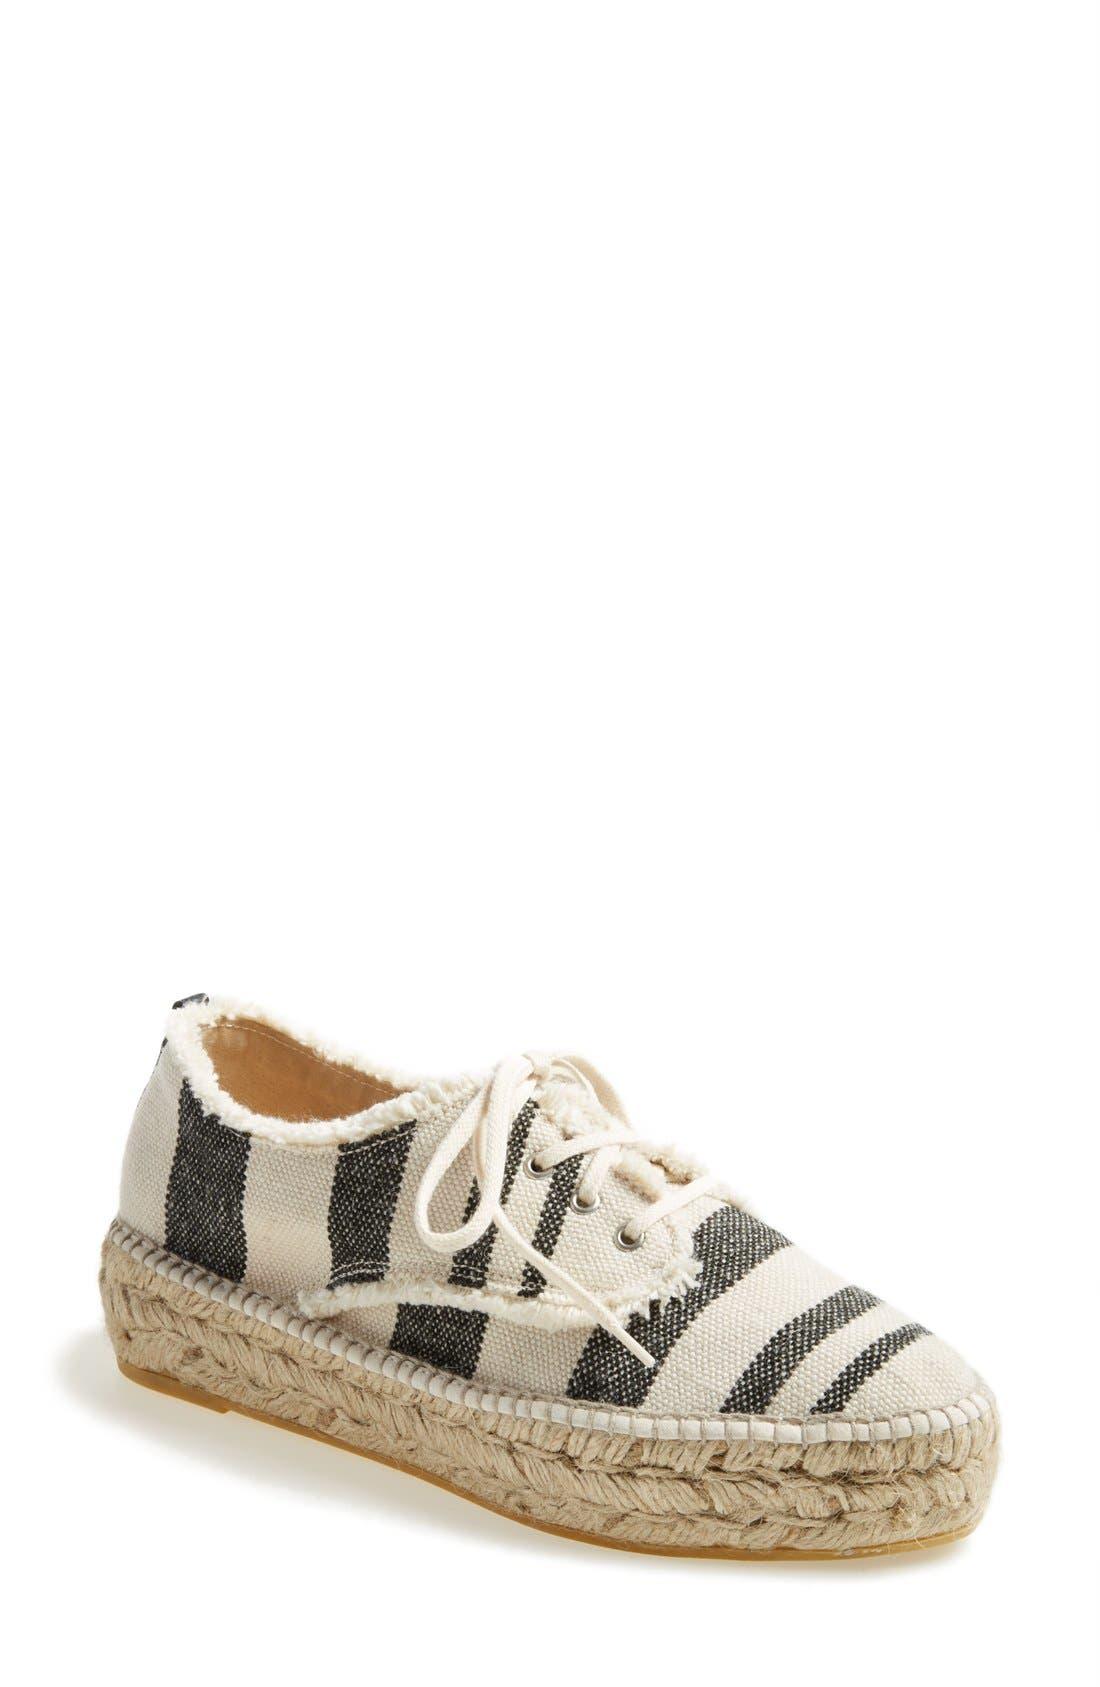 Alternate Image 1 Selected - Loeffler Randall Alfie Espadrille Sneaker (Women)